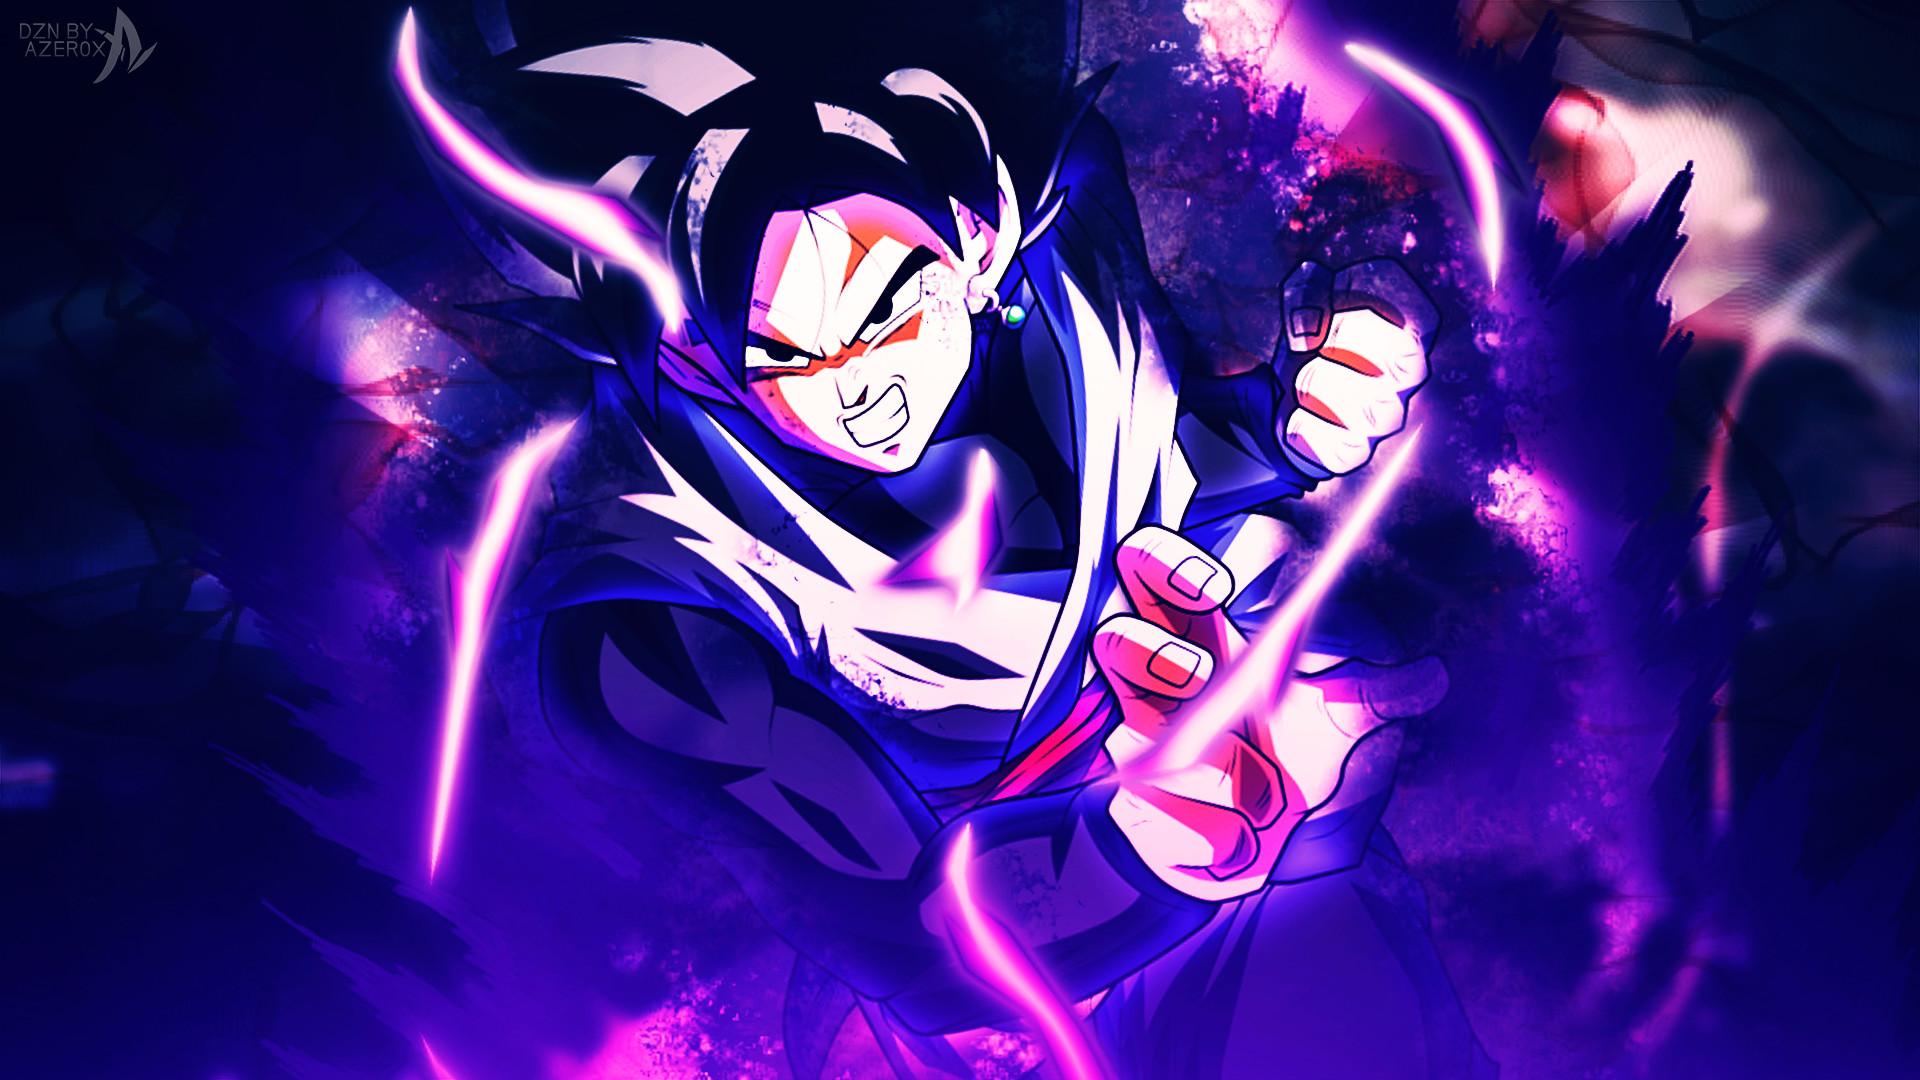 Res: 1920x1080, Dragon Ball Super Black Goku Wallpaper High Resolution